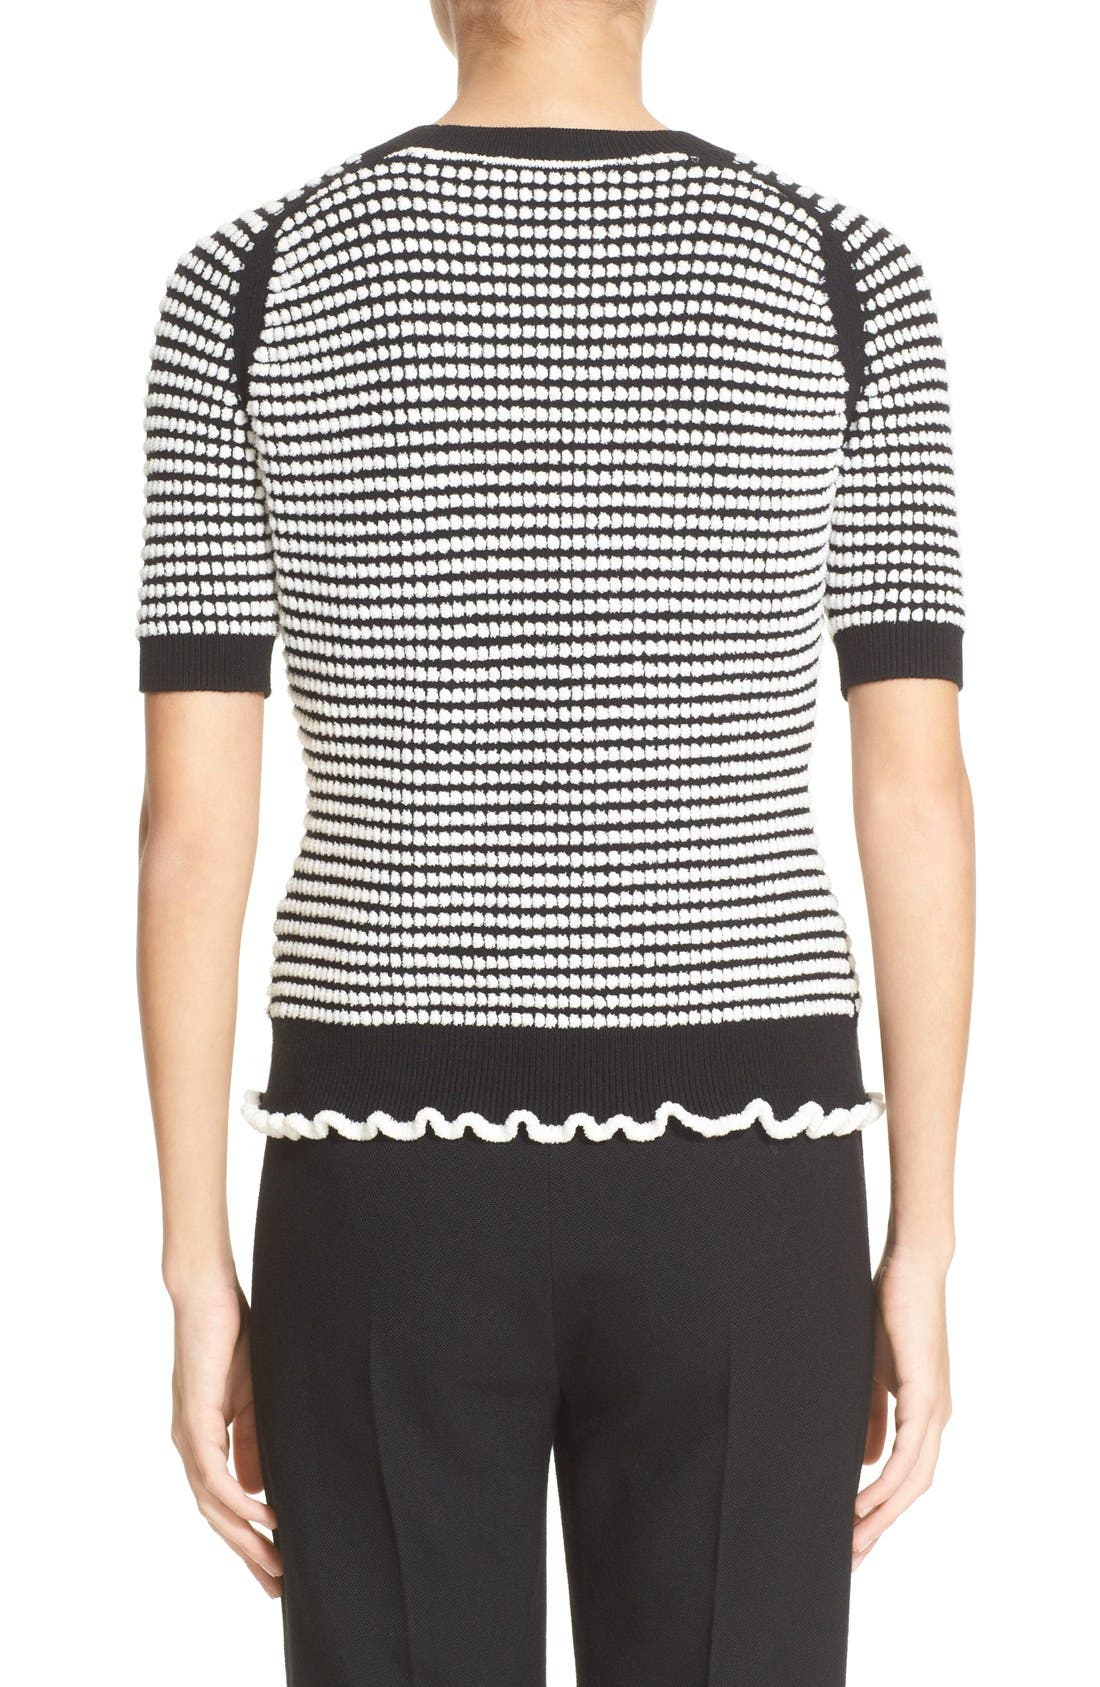 Alternate Image 3  - 3.1 Phillip Lim Knit Ruffle Hem Sweater